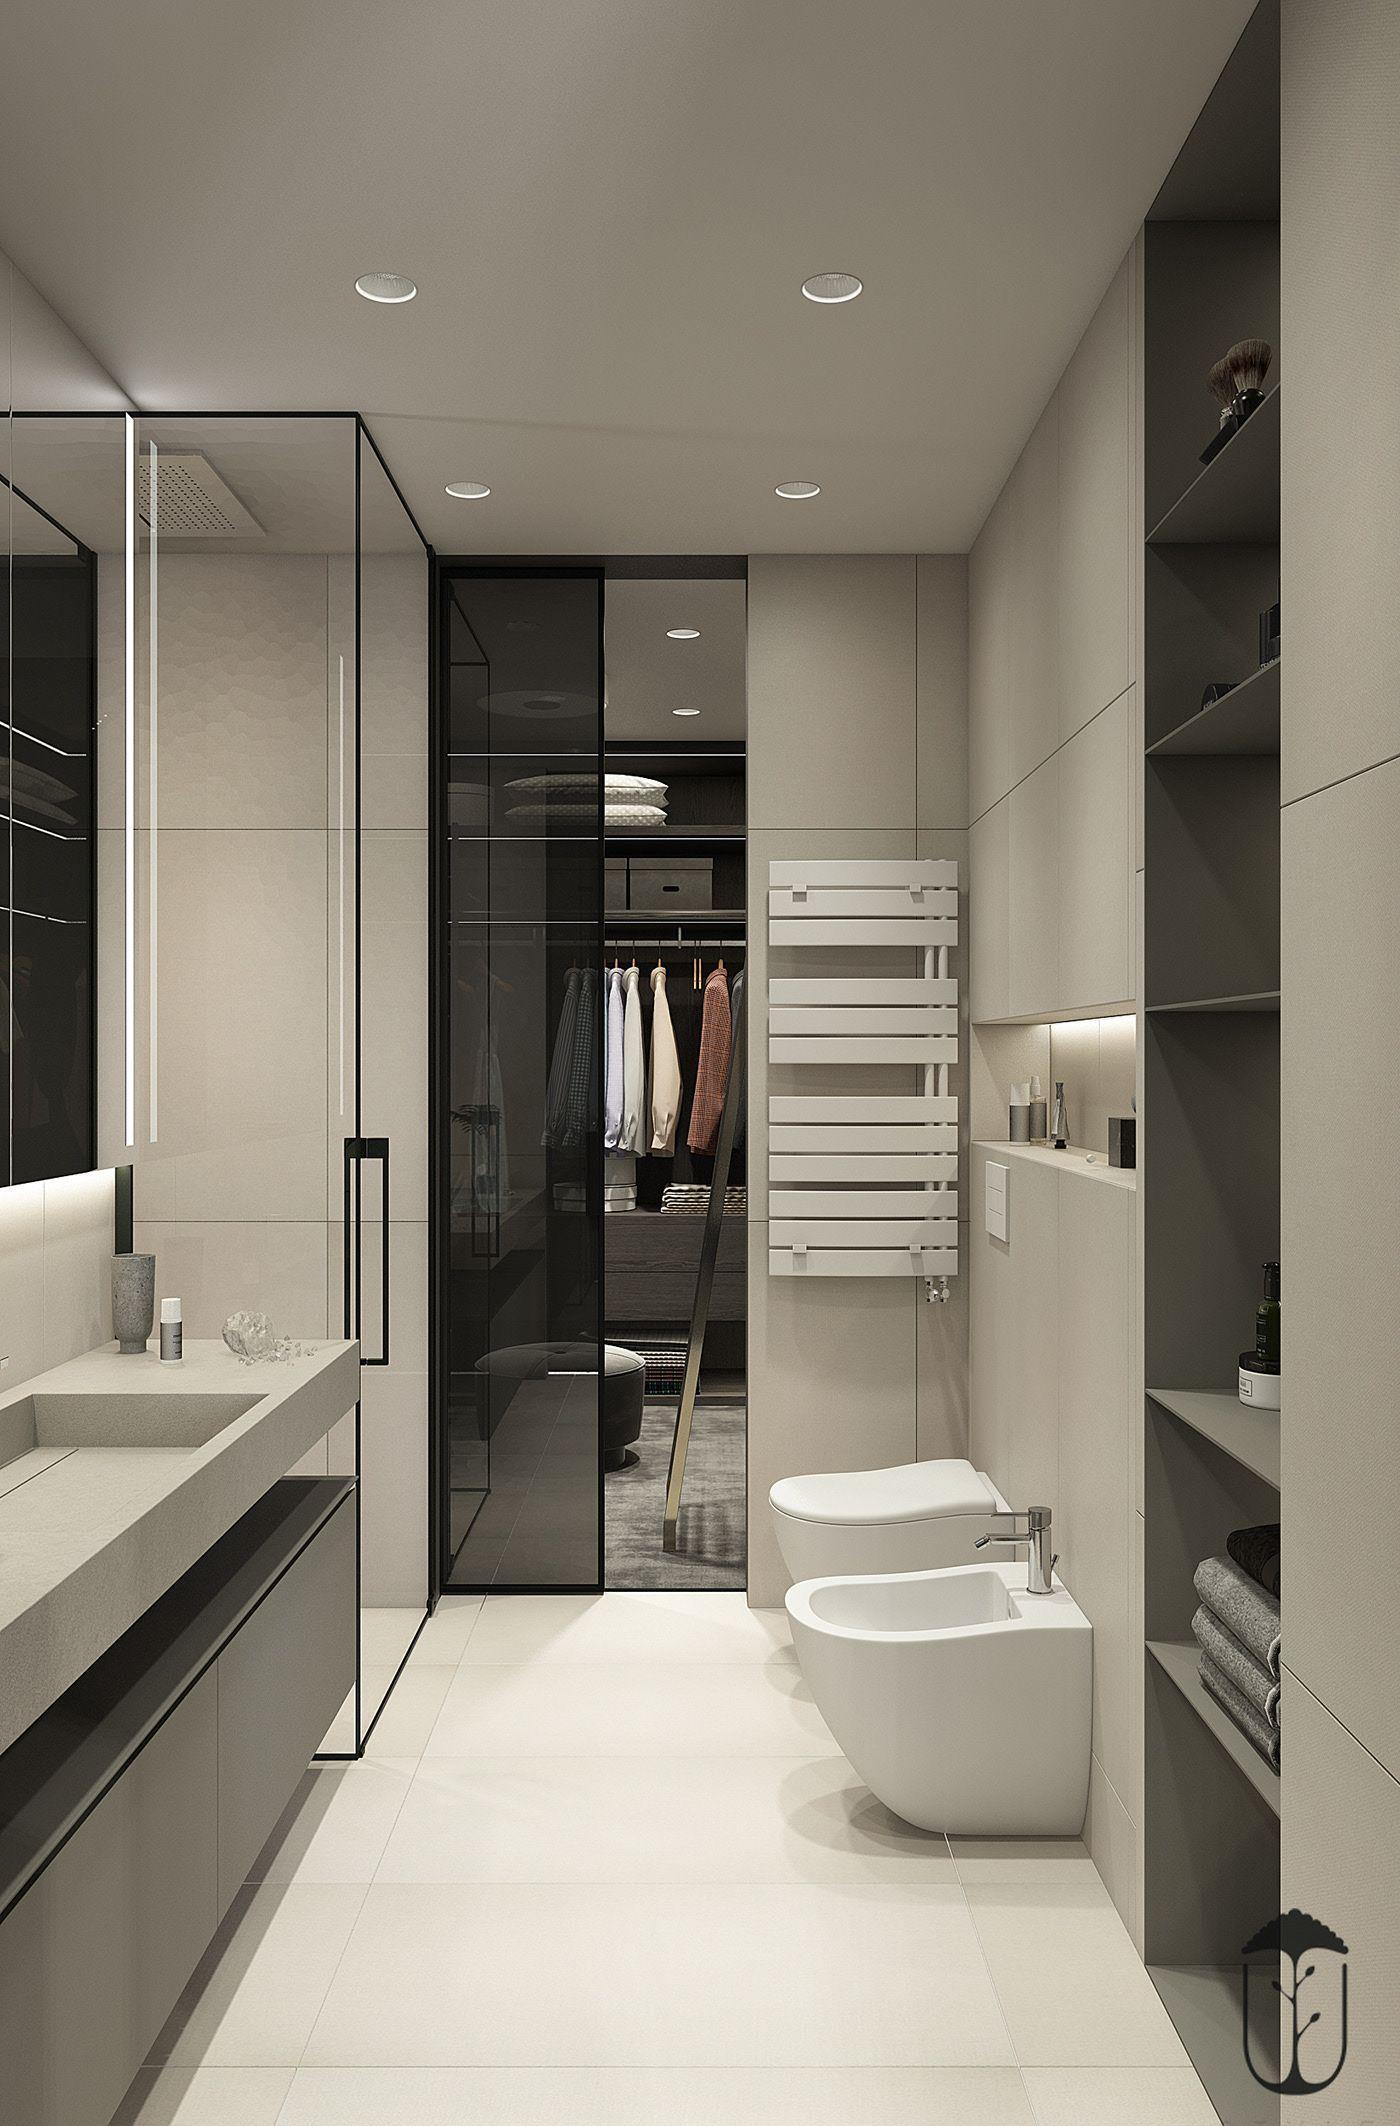 Ui028 On Behance Modern Homes In 2019 Bathroom Interior Design Bathroom Interior Bathroom Interior Design Modern Bathroom Design